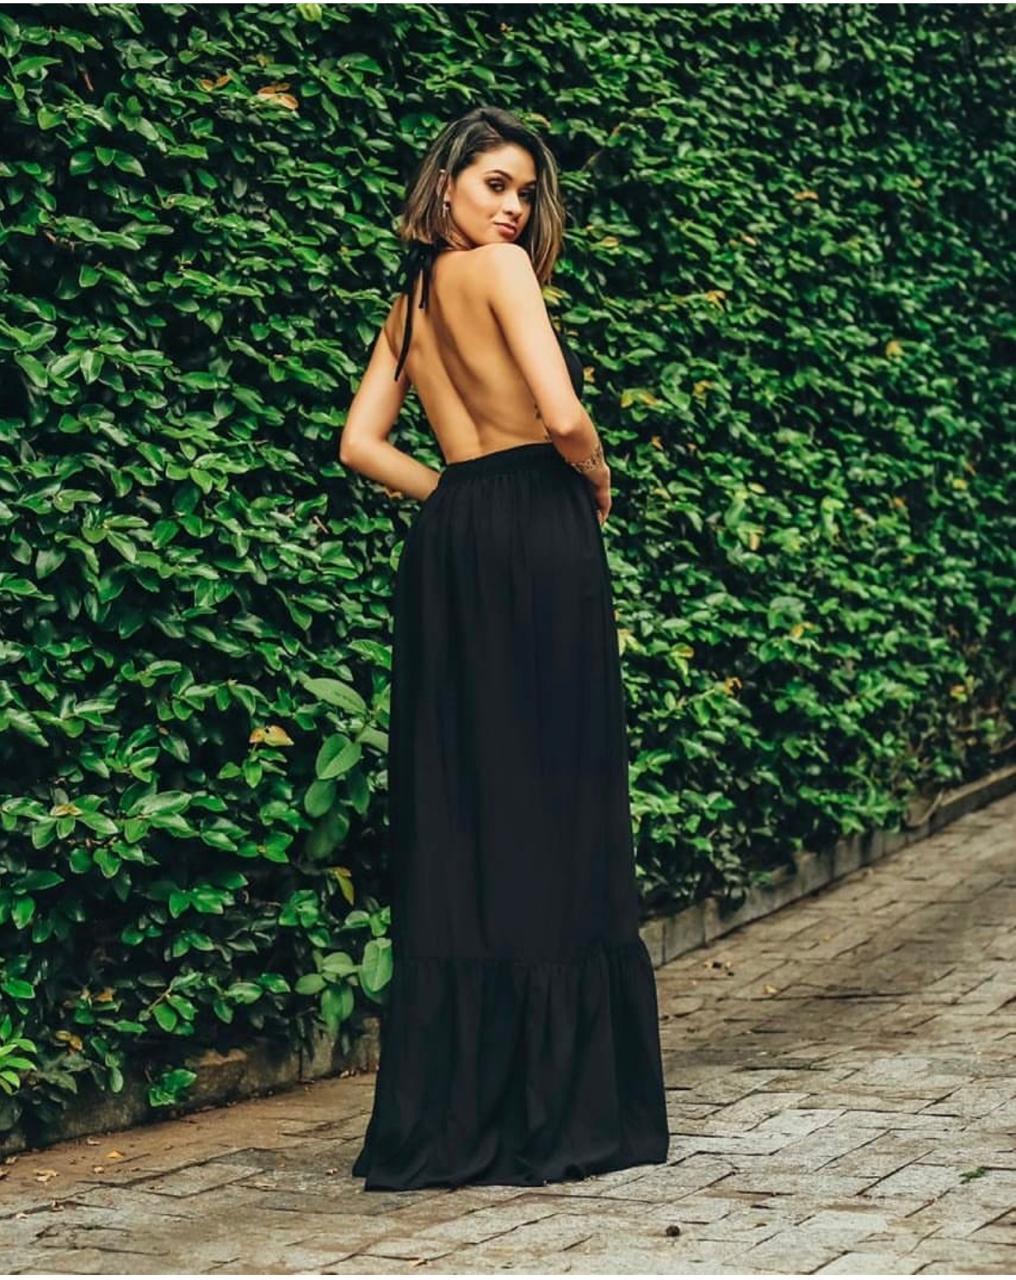 Vestido Longo com Fenda Frontal